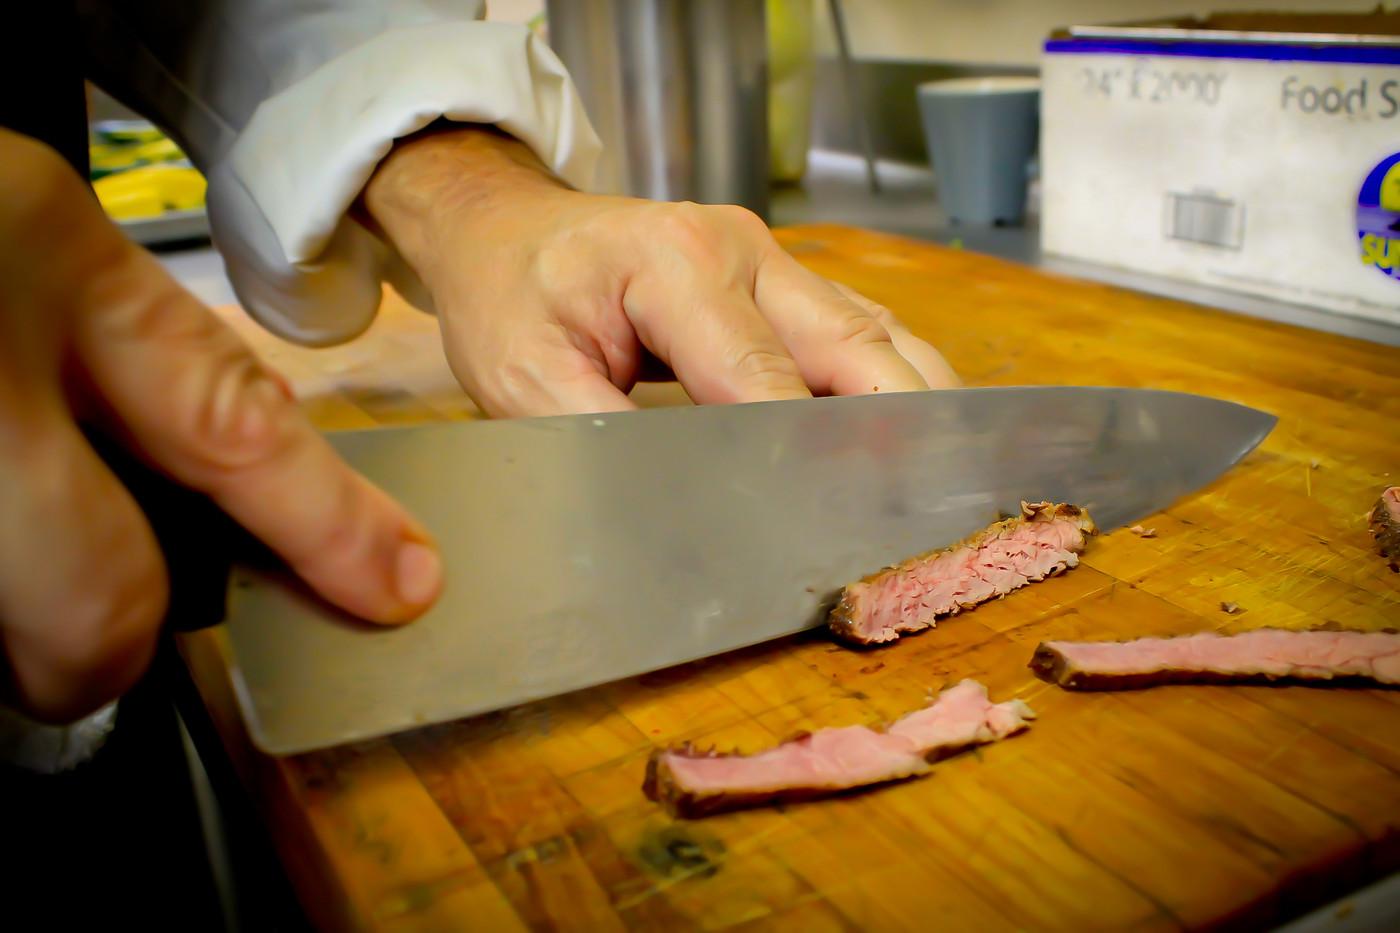 4 seasons chef cutting meat.jpg